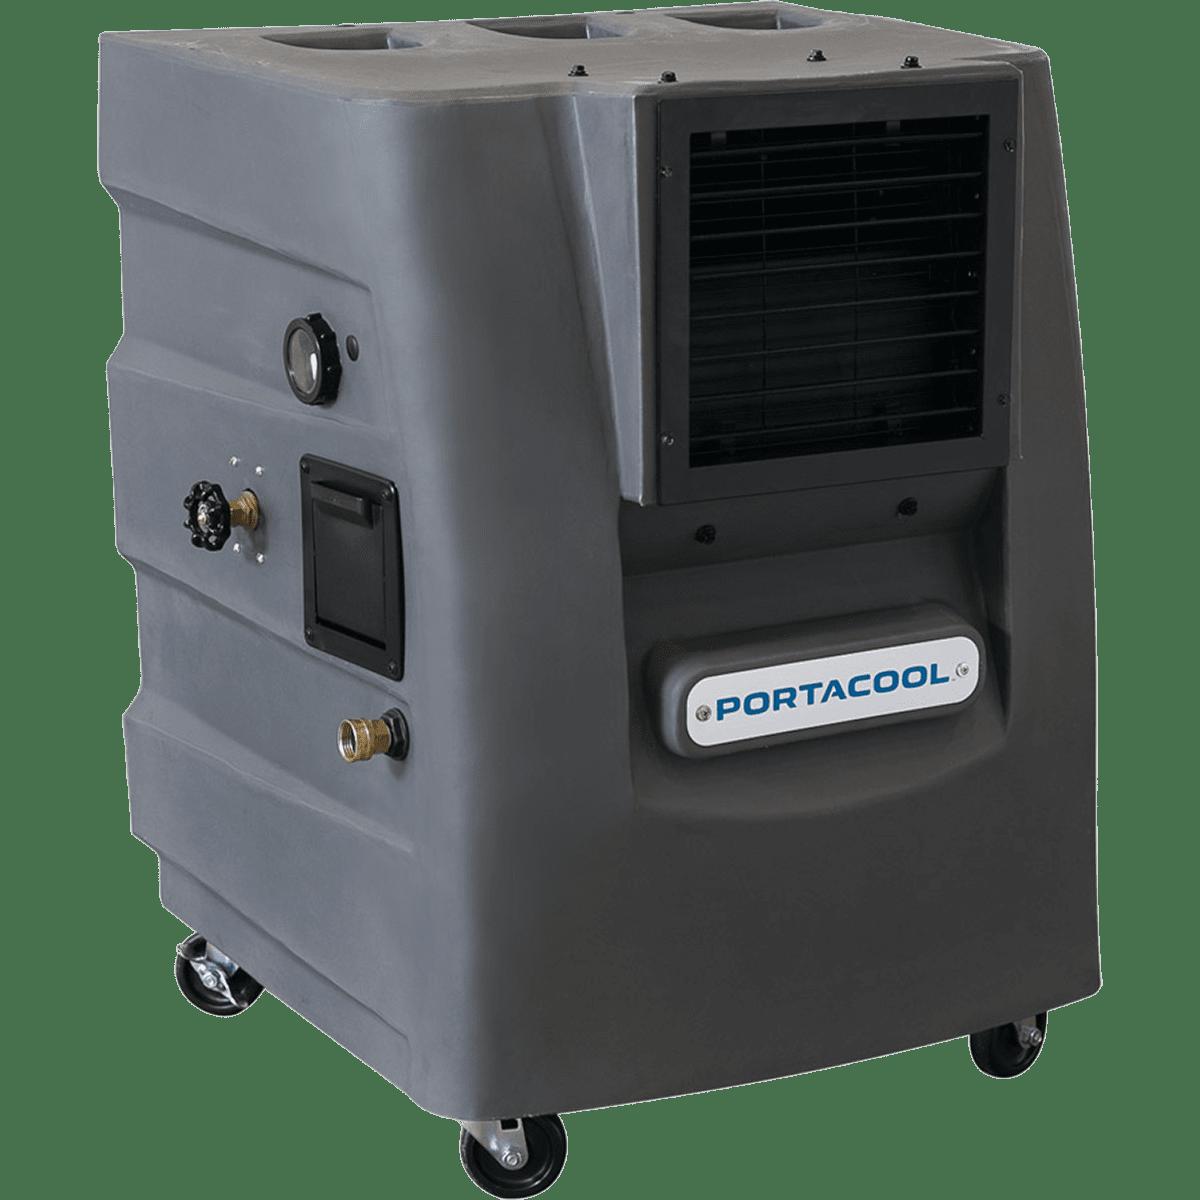 Portacool Cyclone 120 Portable Evaporative Cooler (PACCY120GA1) po6464